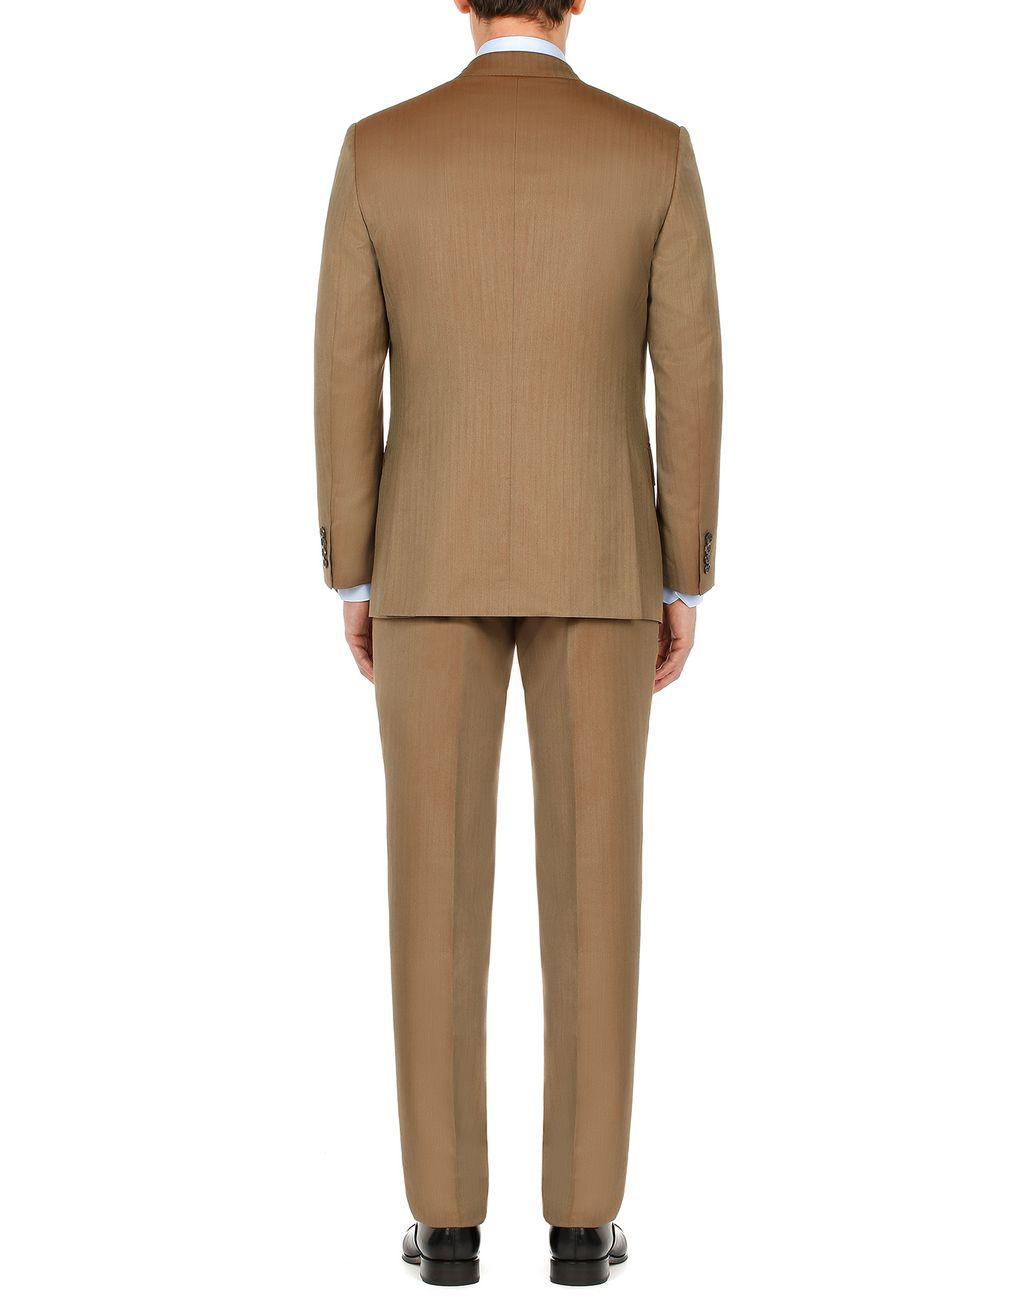 BRIONI Camel Herringbone Parioli Suit Suits & Jackets Man d